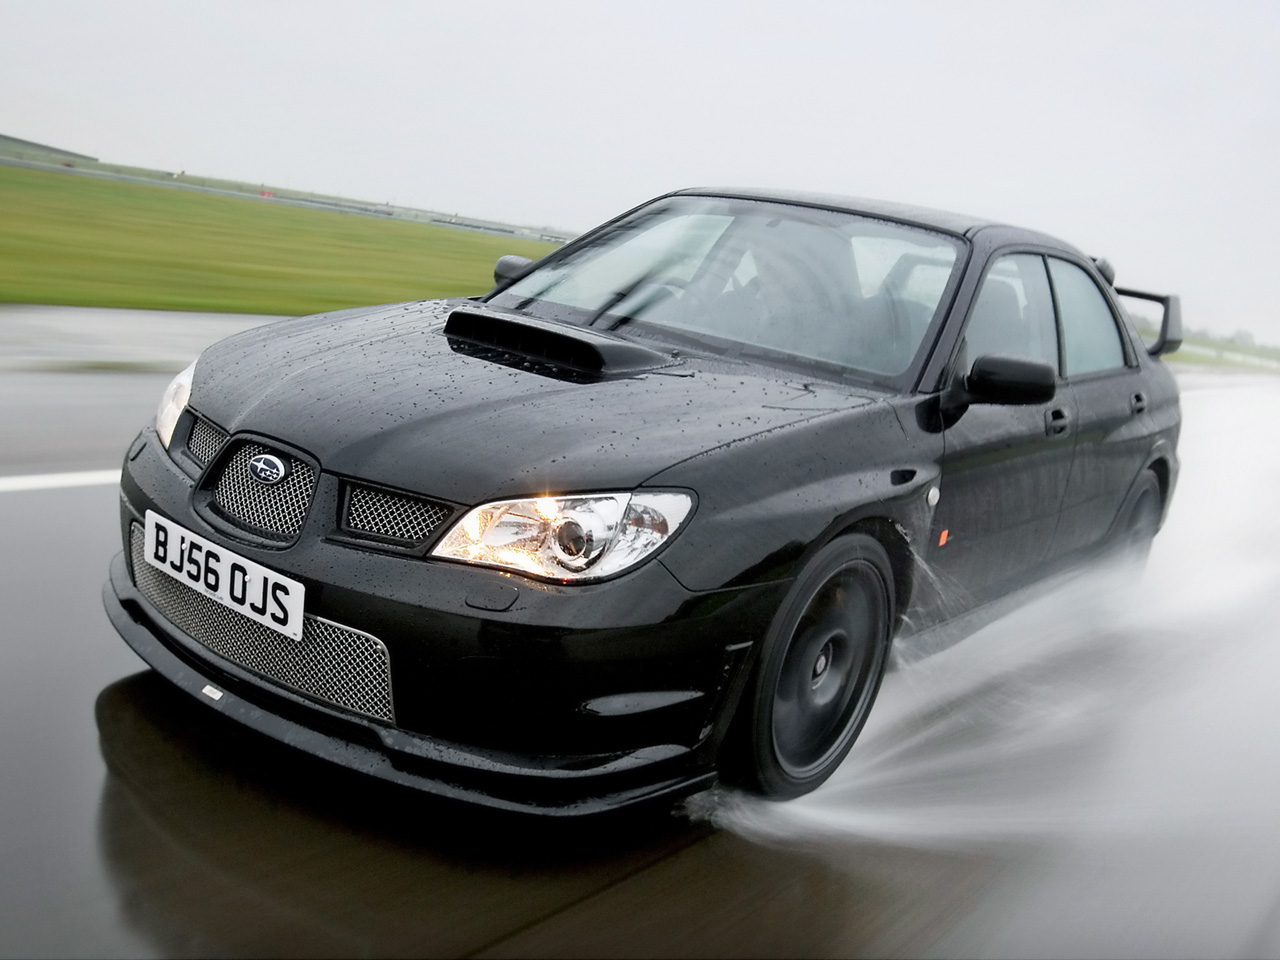 2007 Subaru Impreza WRX STi Overview